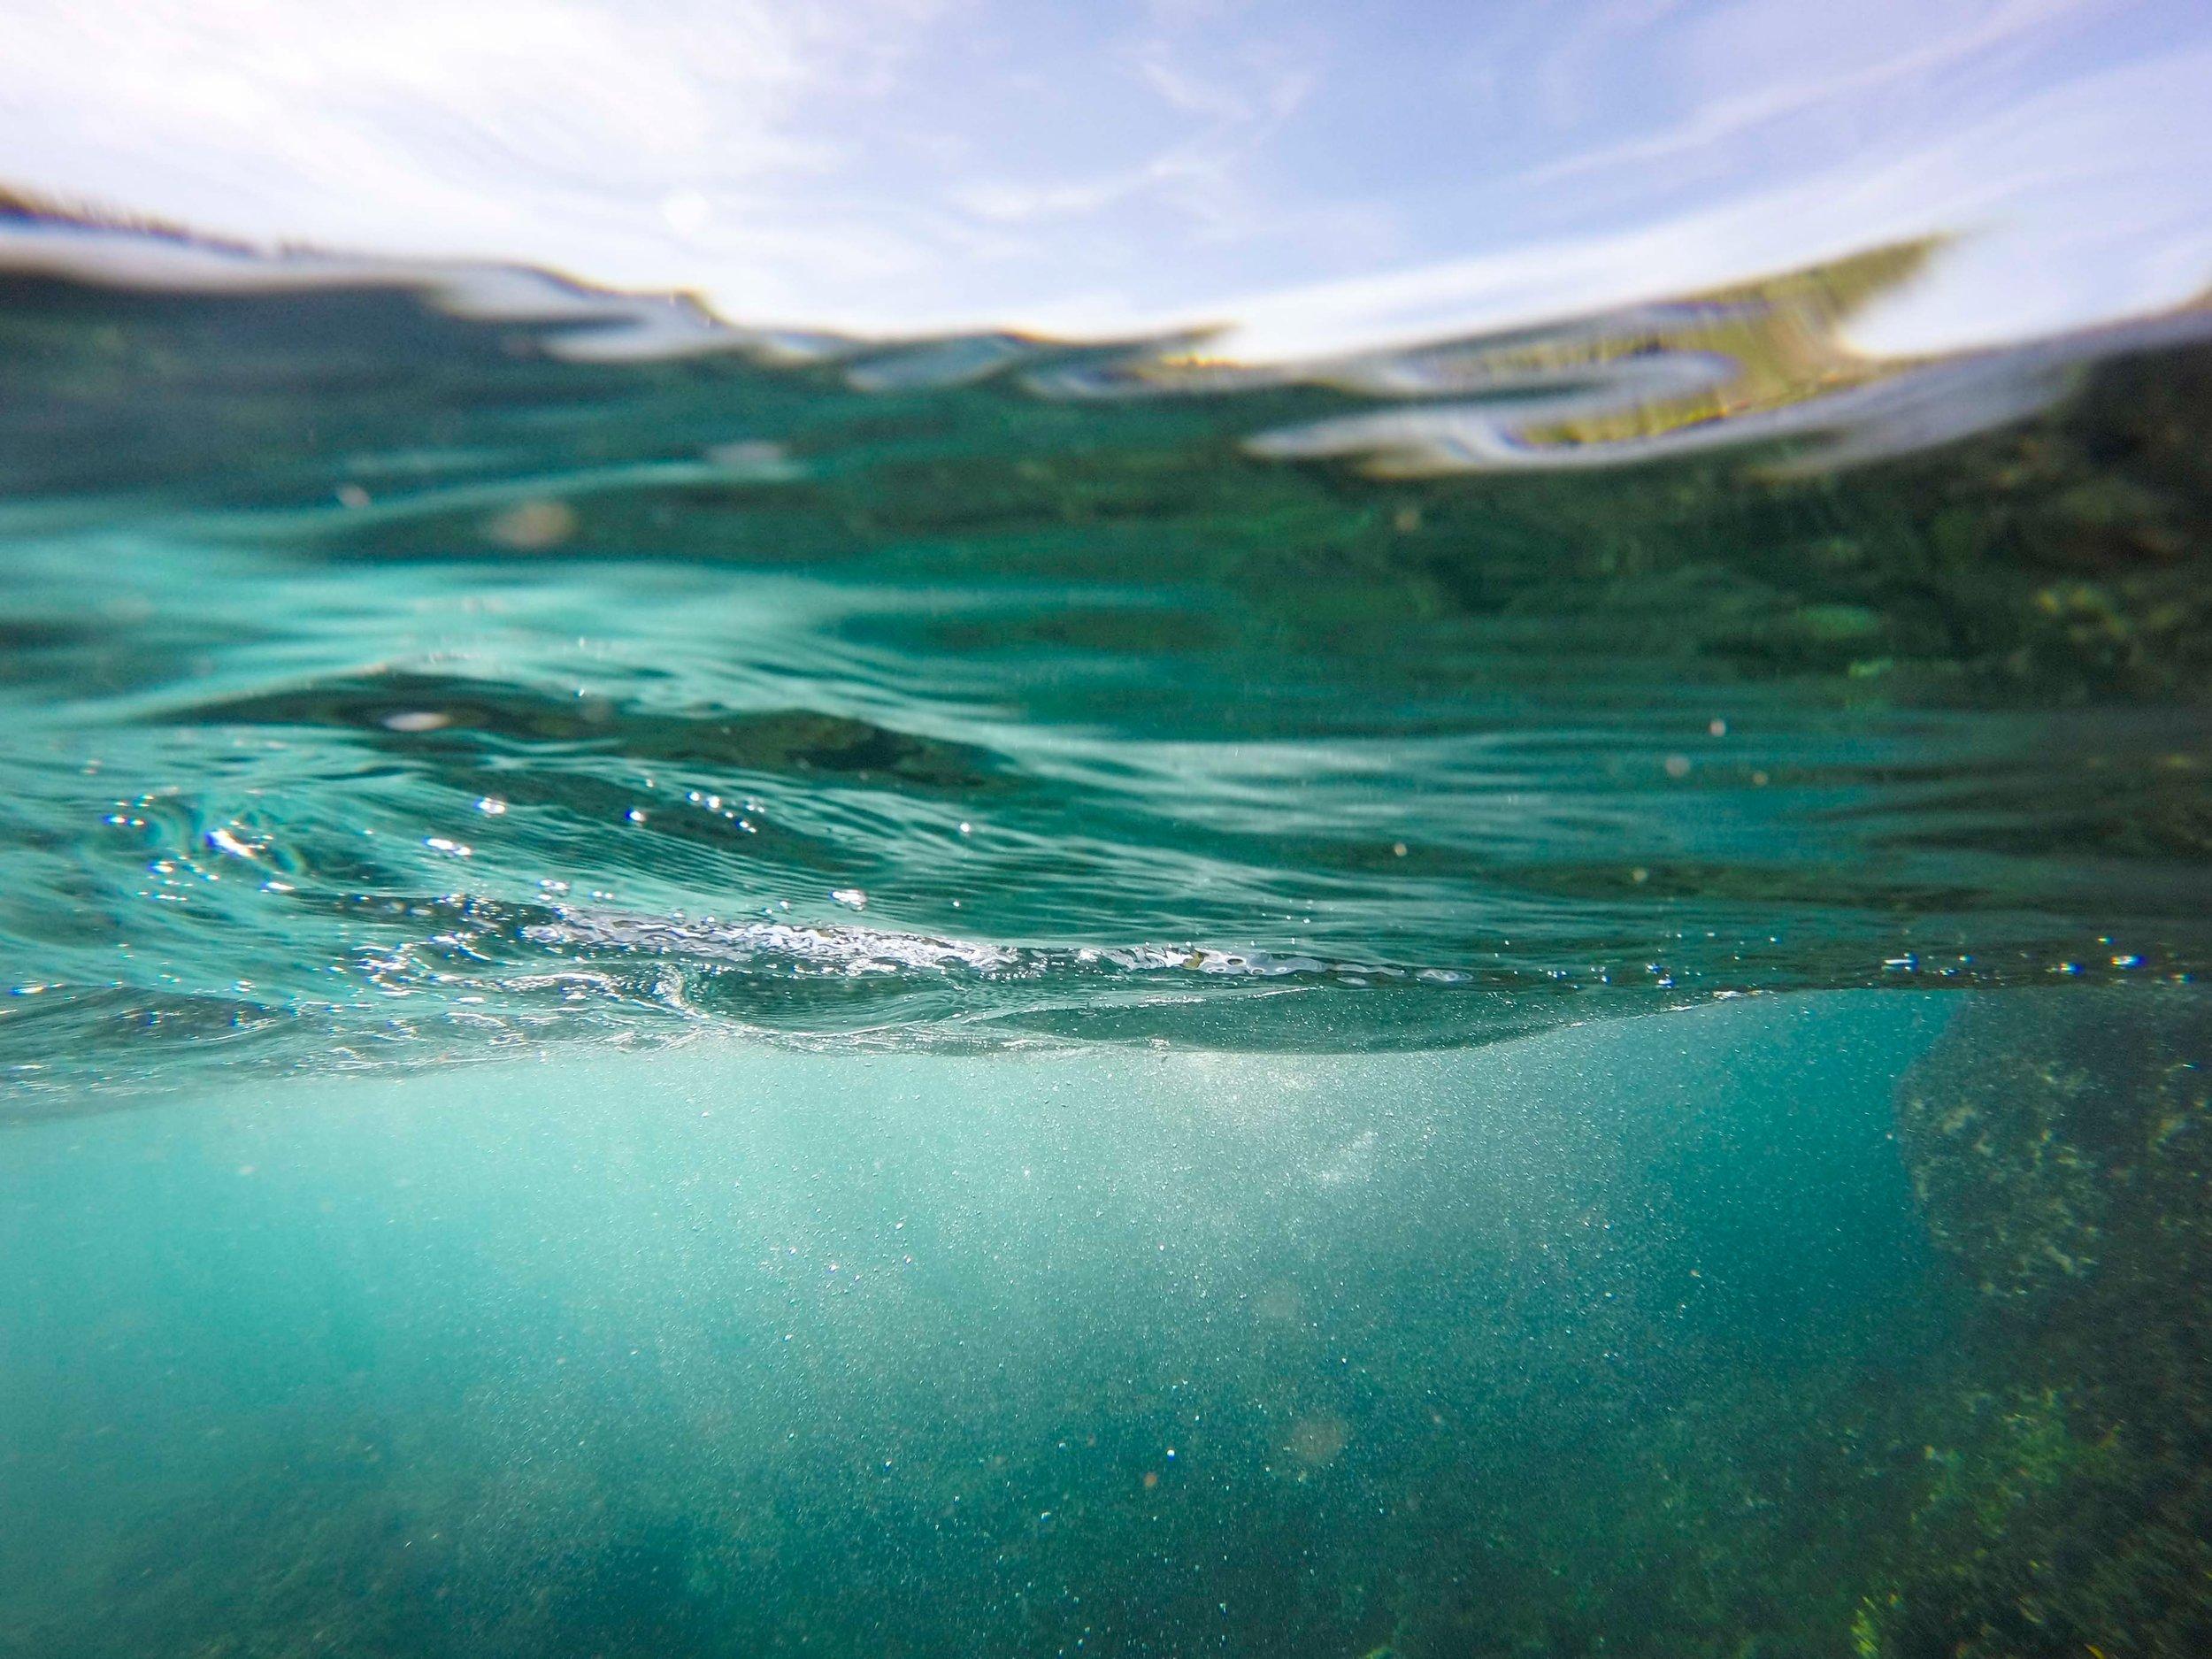 A healthy ocean equals a healthy planet.